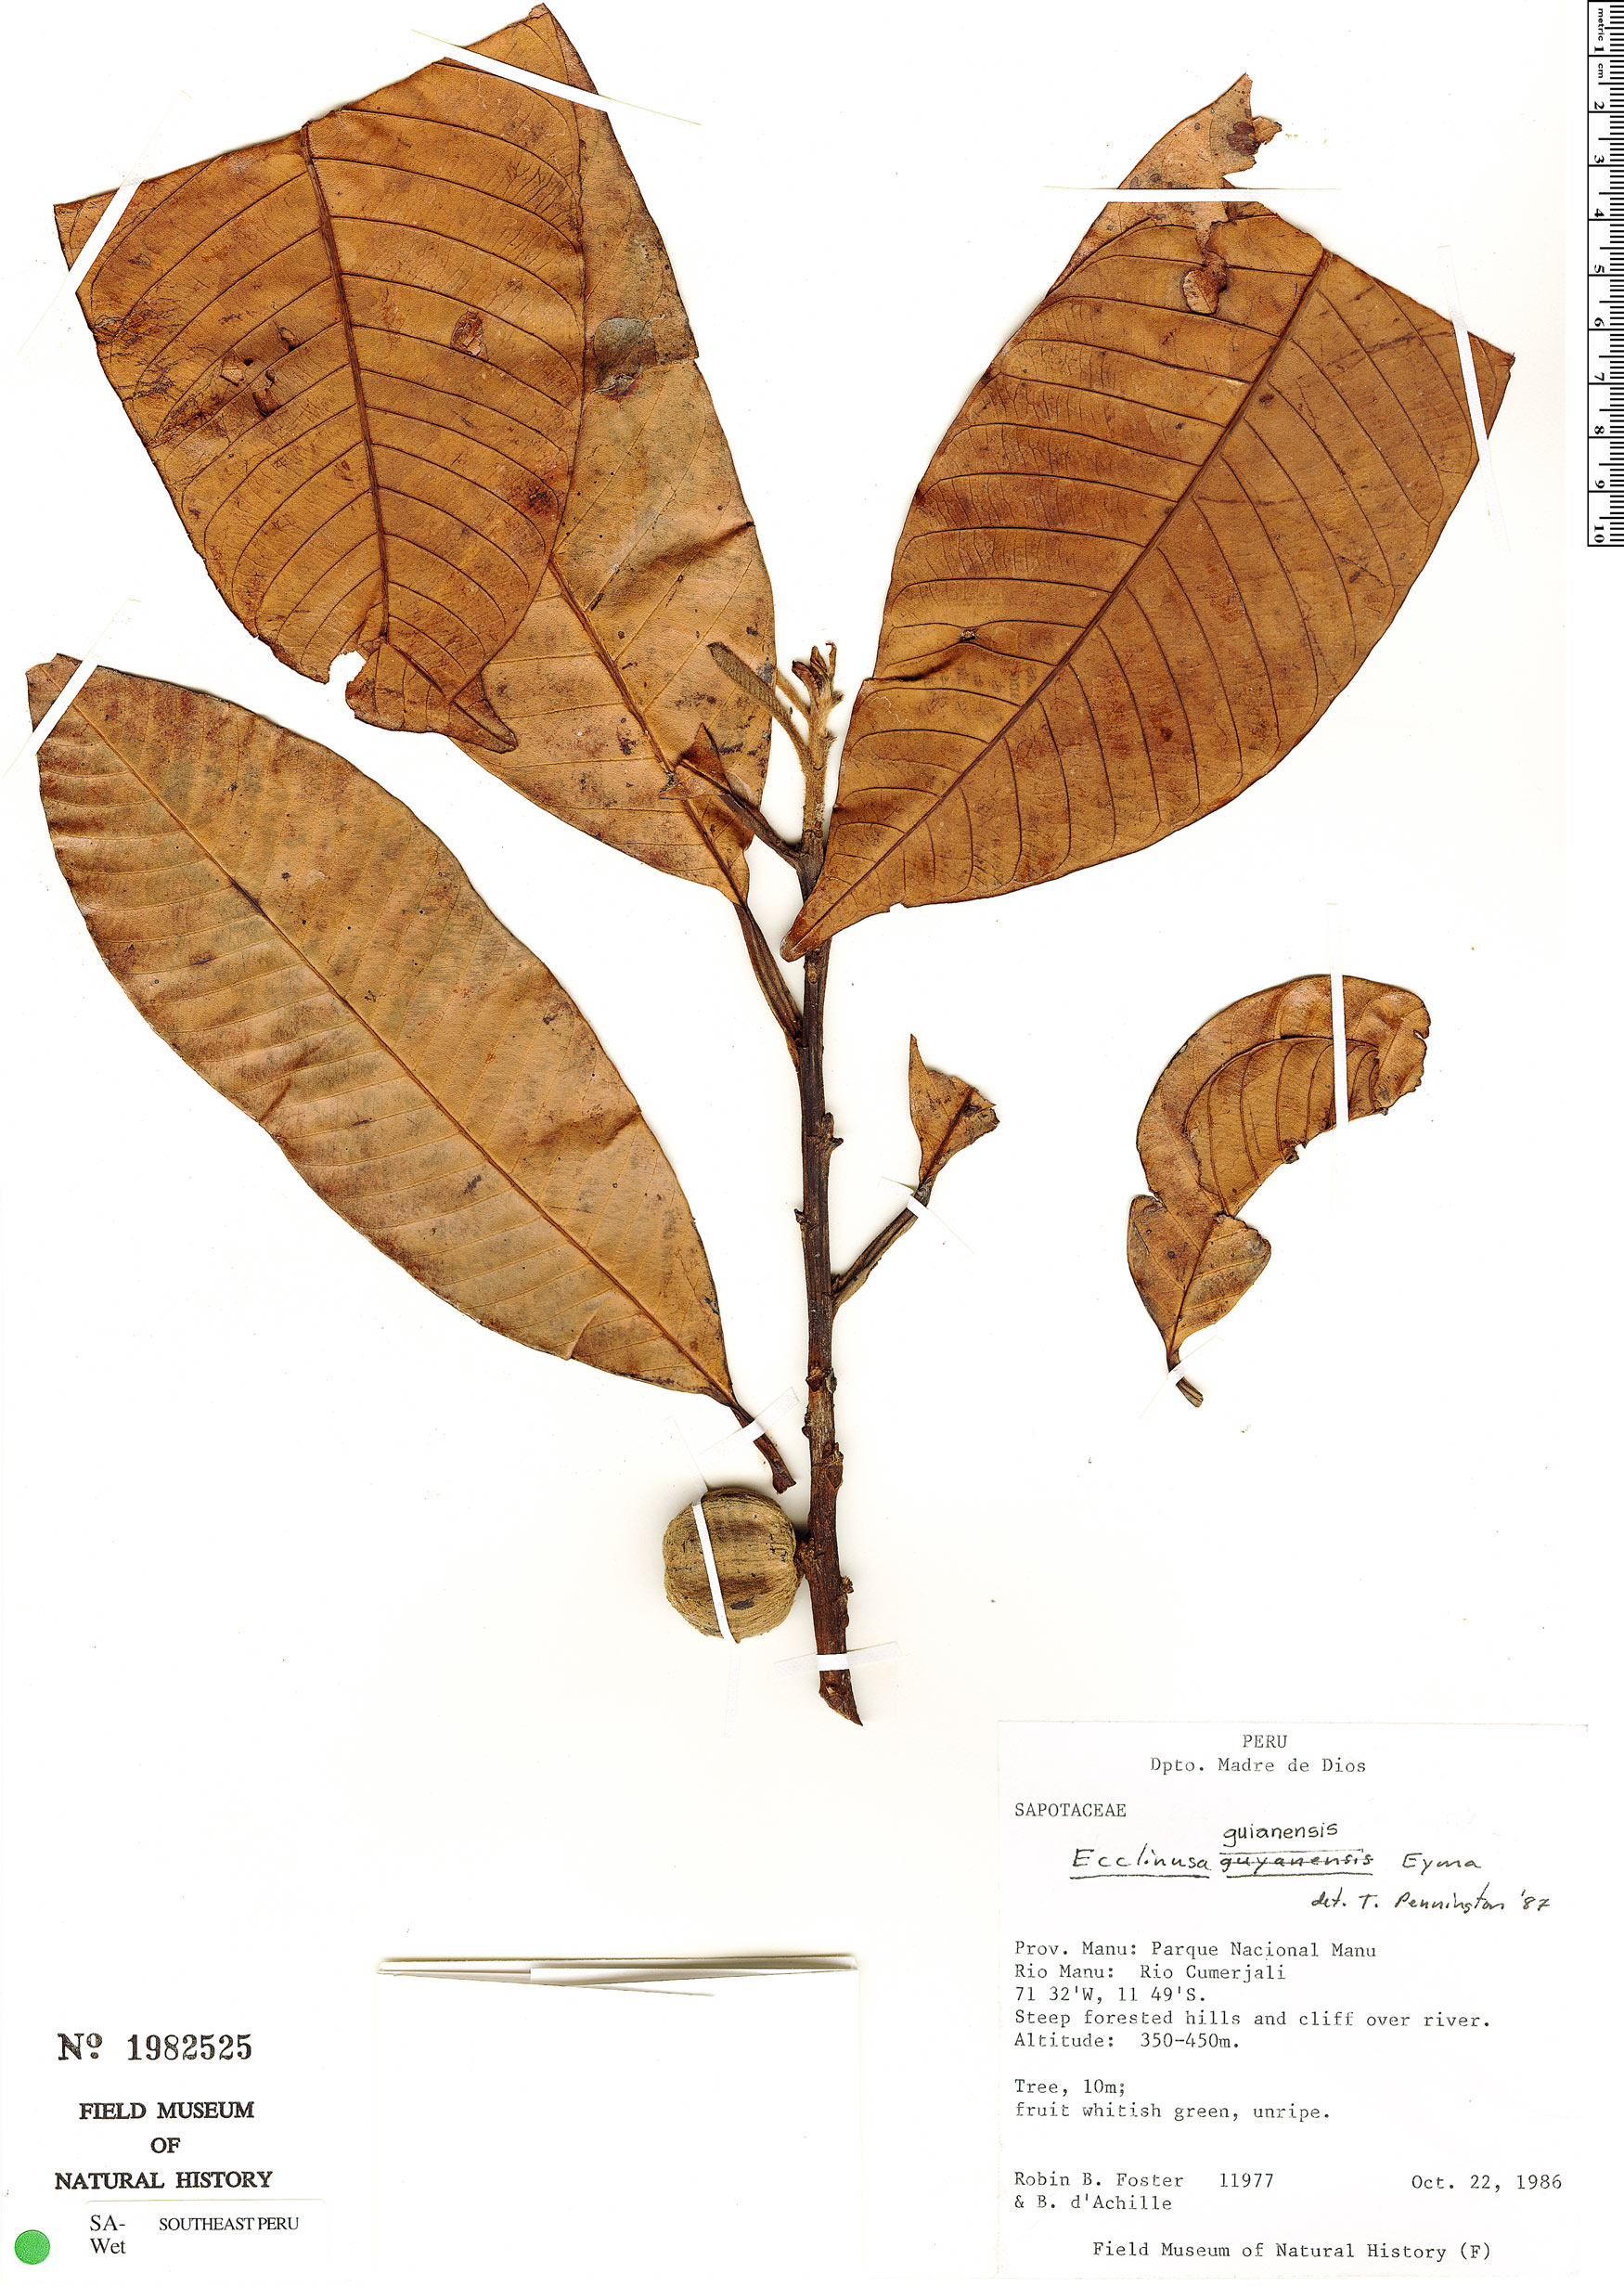 Specimen: Ecclinusa guianensis